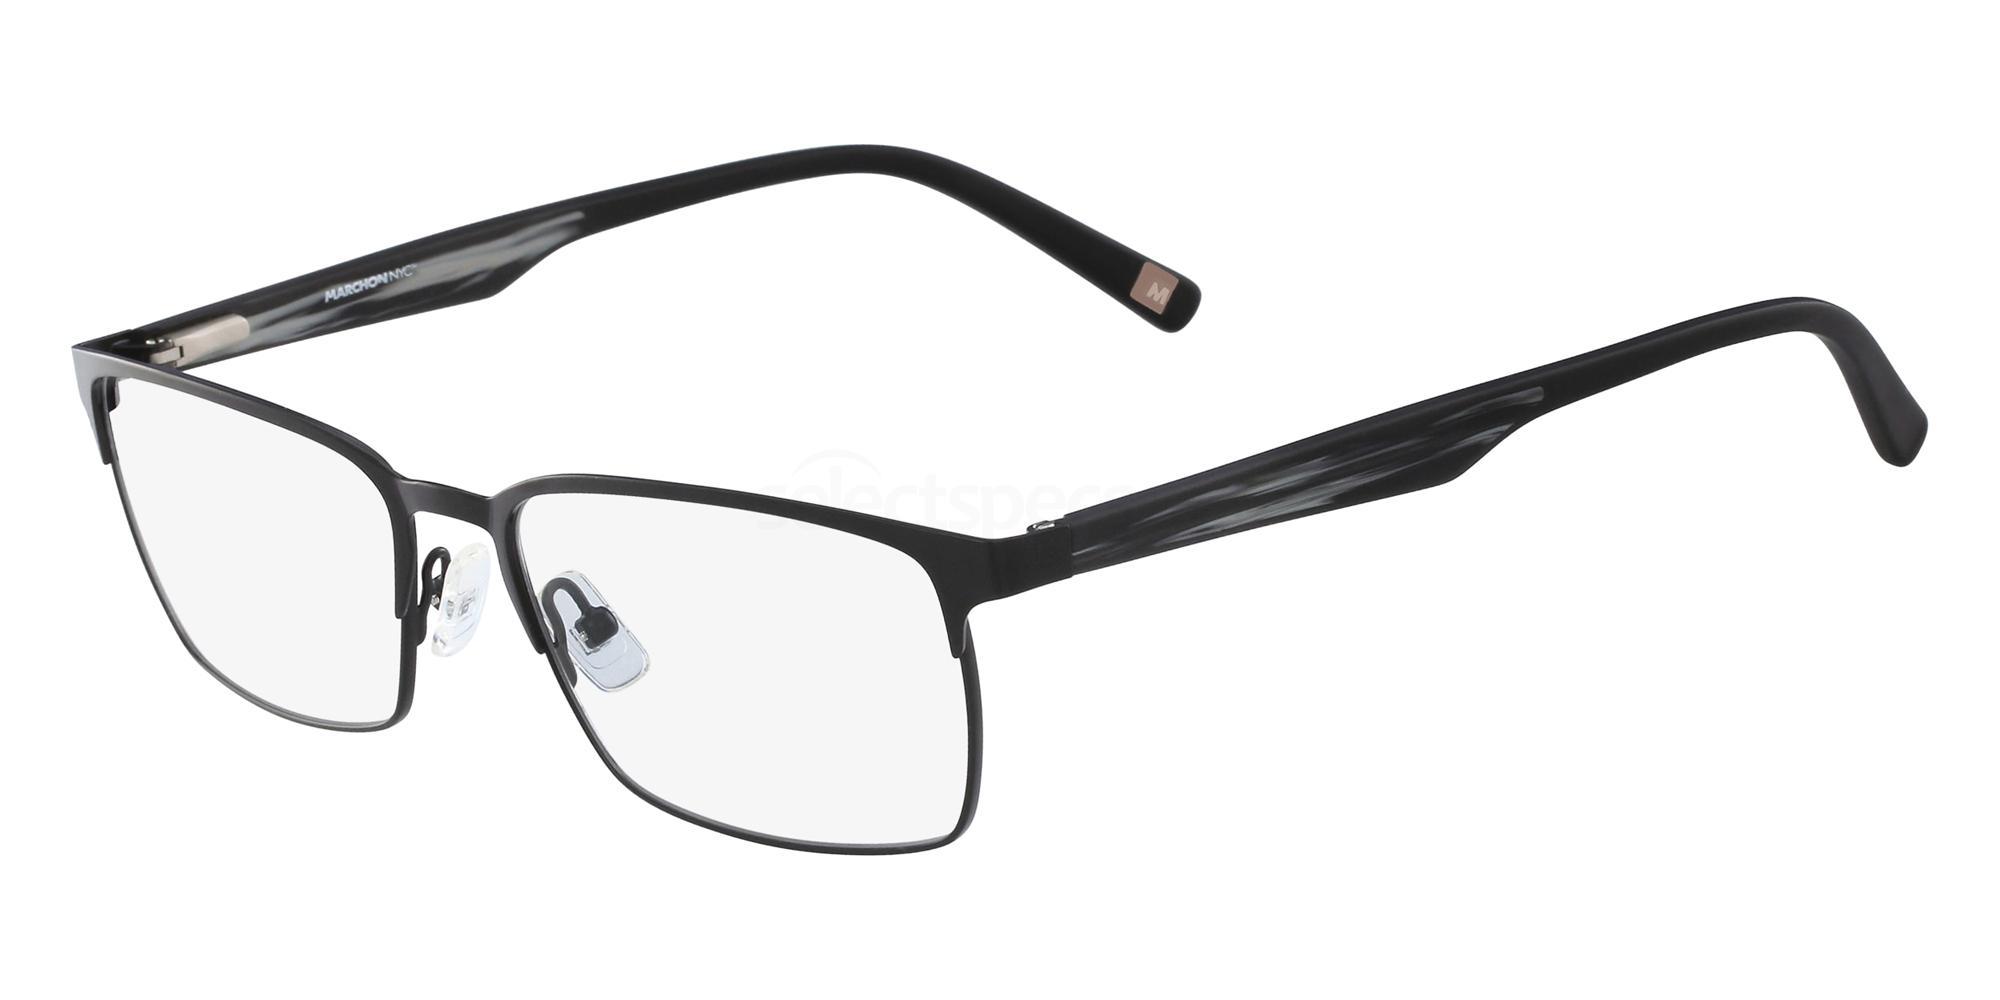 001 M-POWELL Glasses, Marchon